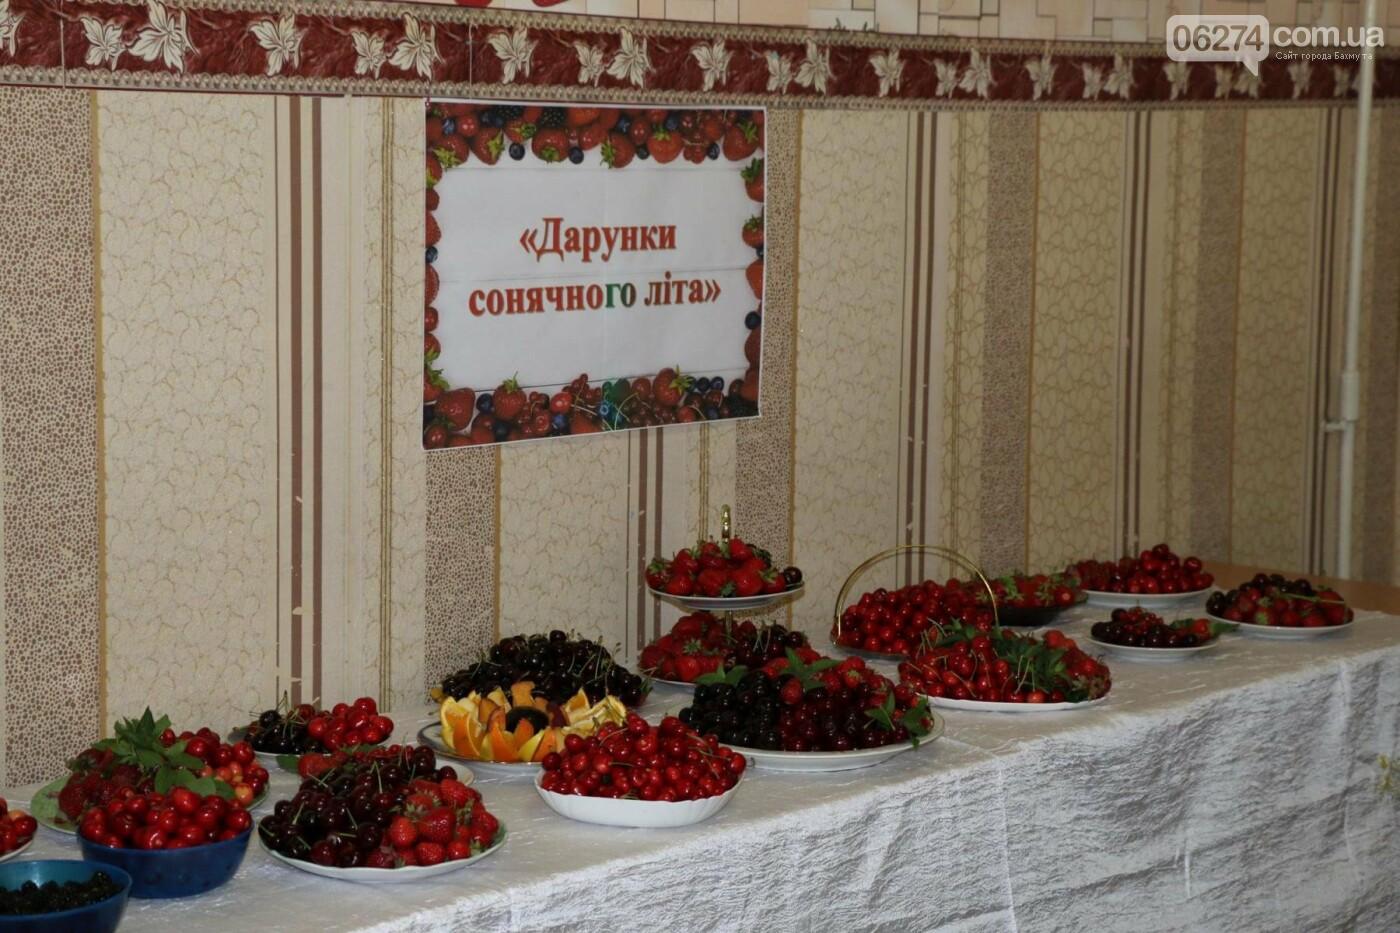 В Бахмуте провели «Мастер-шеф» на «Территории вкусняшек», фото-13